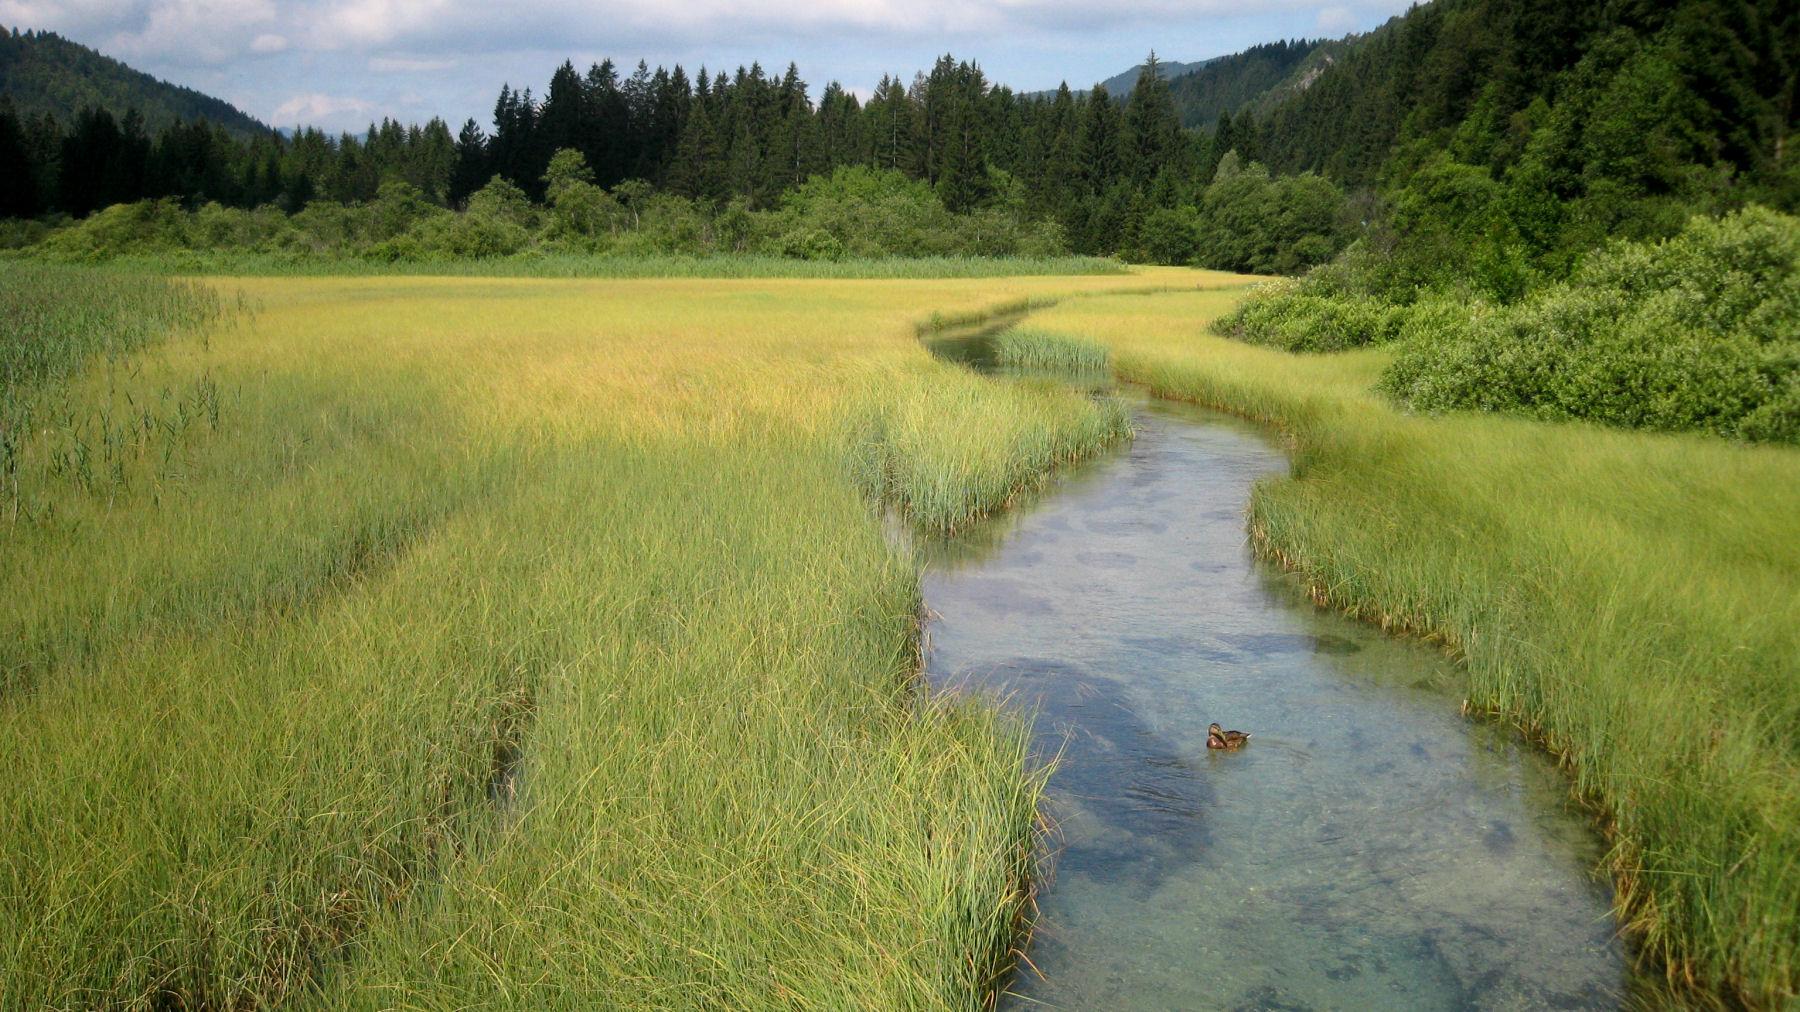 zelenci-nature-reserve-kranjska-gora